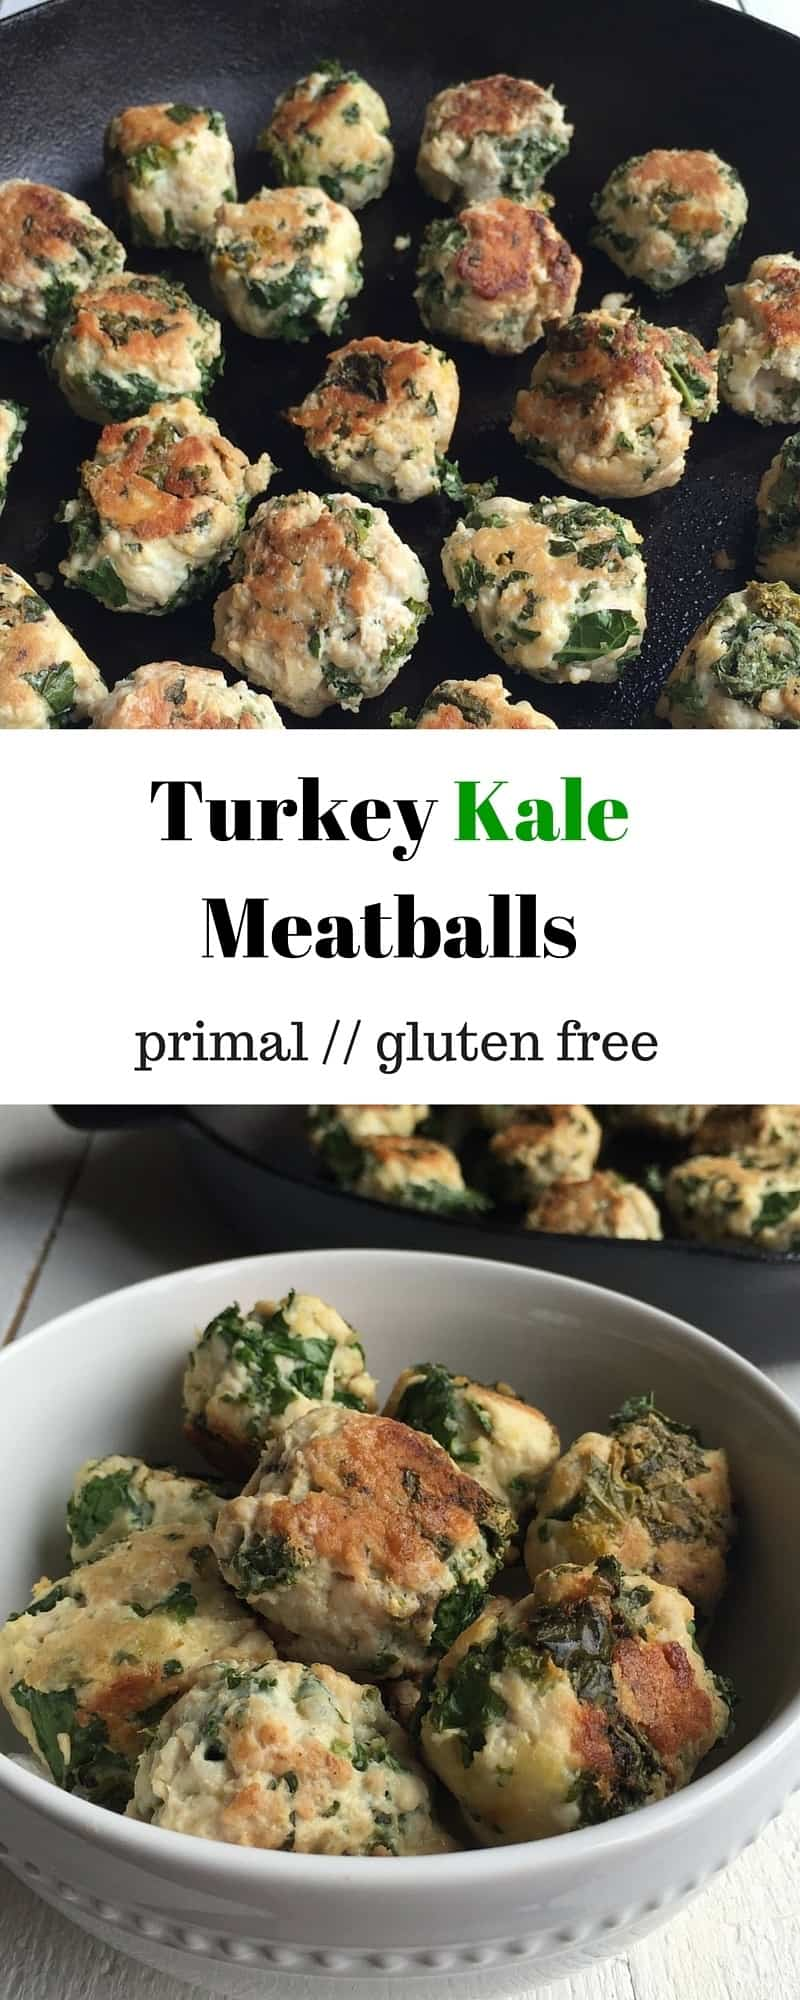 Turkey Kale Meatballs